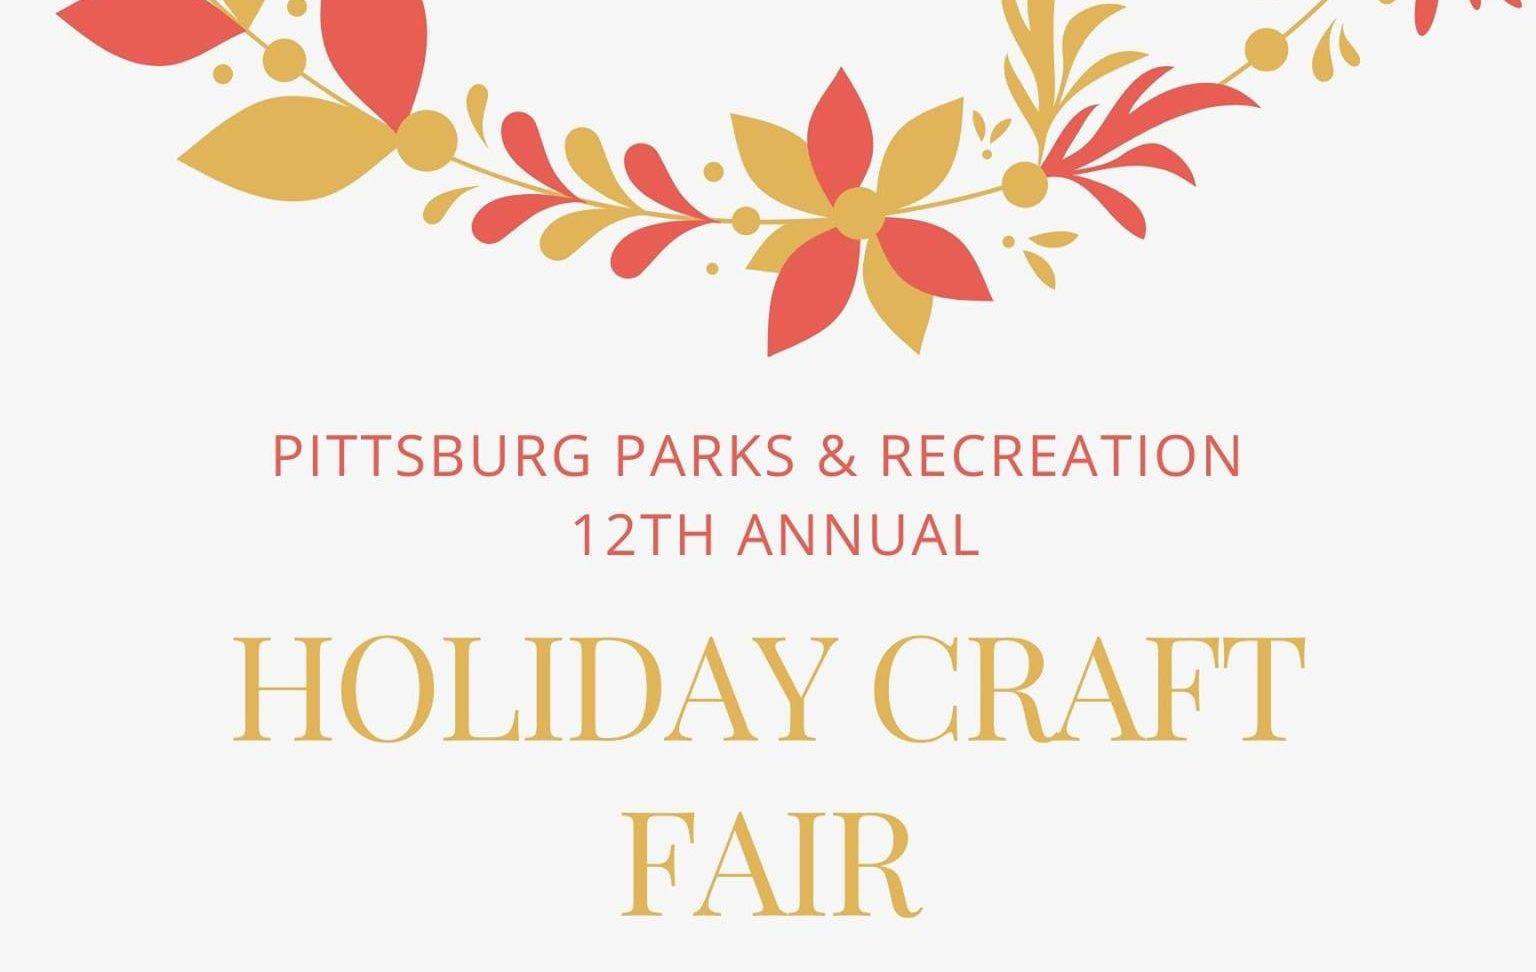 Pittsburg Holiday Craft Fair set for Nov. 14